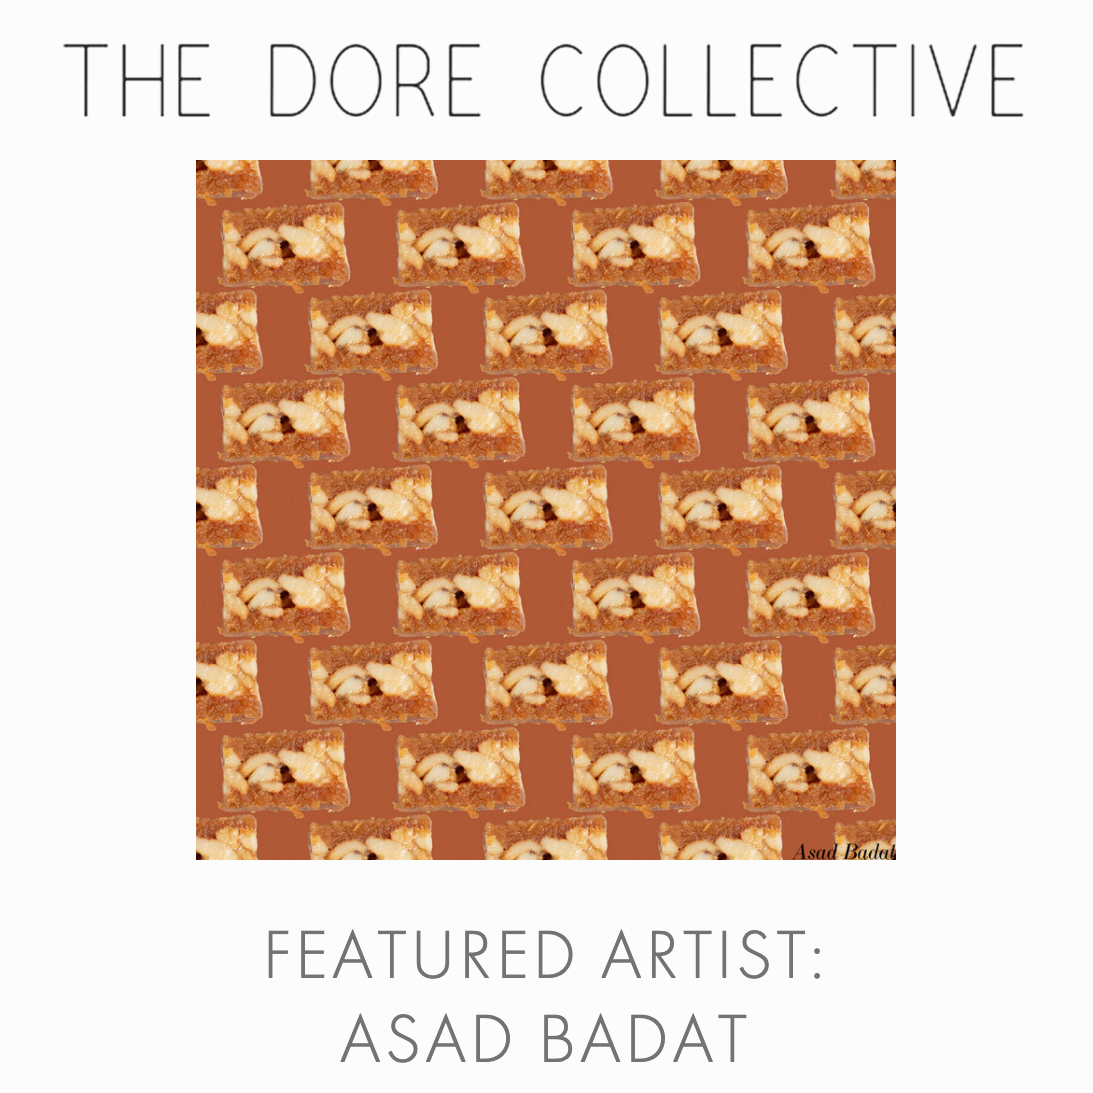 Asad-Badat-Featured-Artist-Dore-Collective.jpg